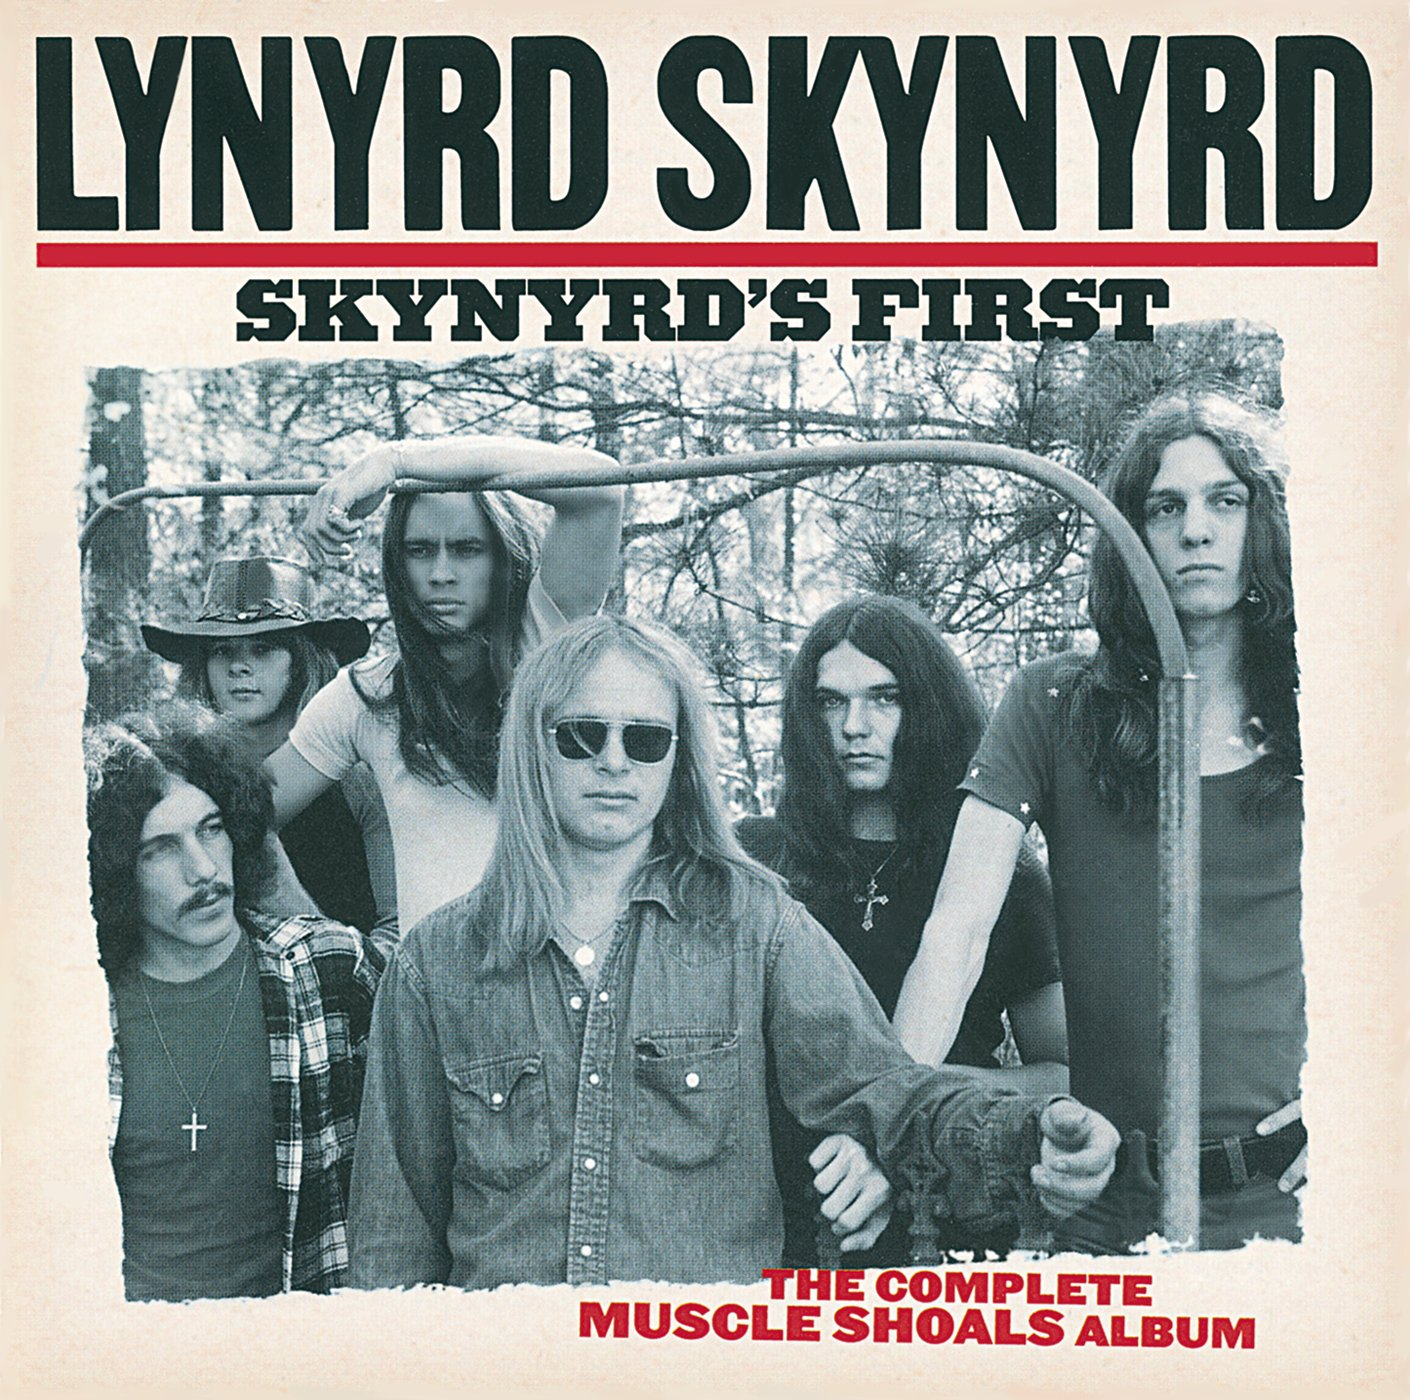 Skynyrd's First: The Complete Muscle Shoals Album by Lynyrd Skynyrd